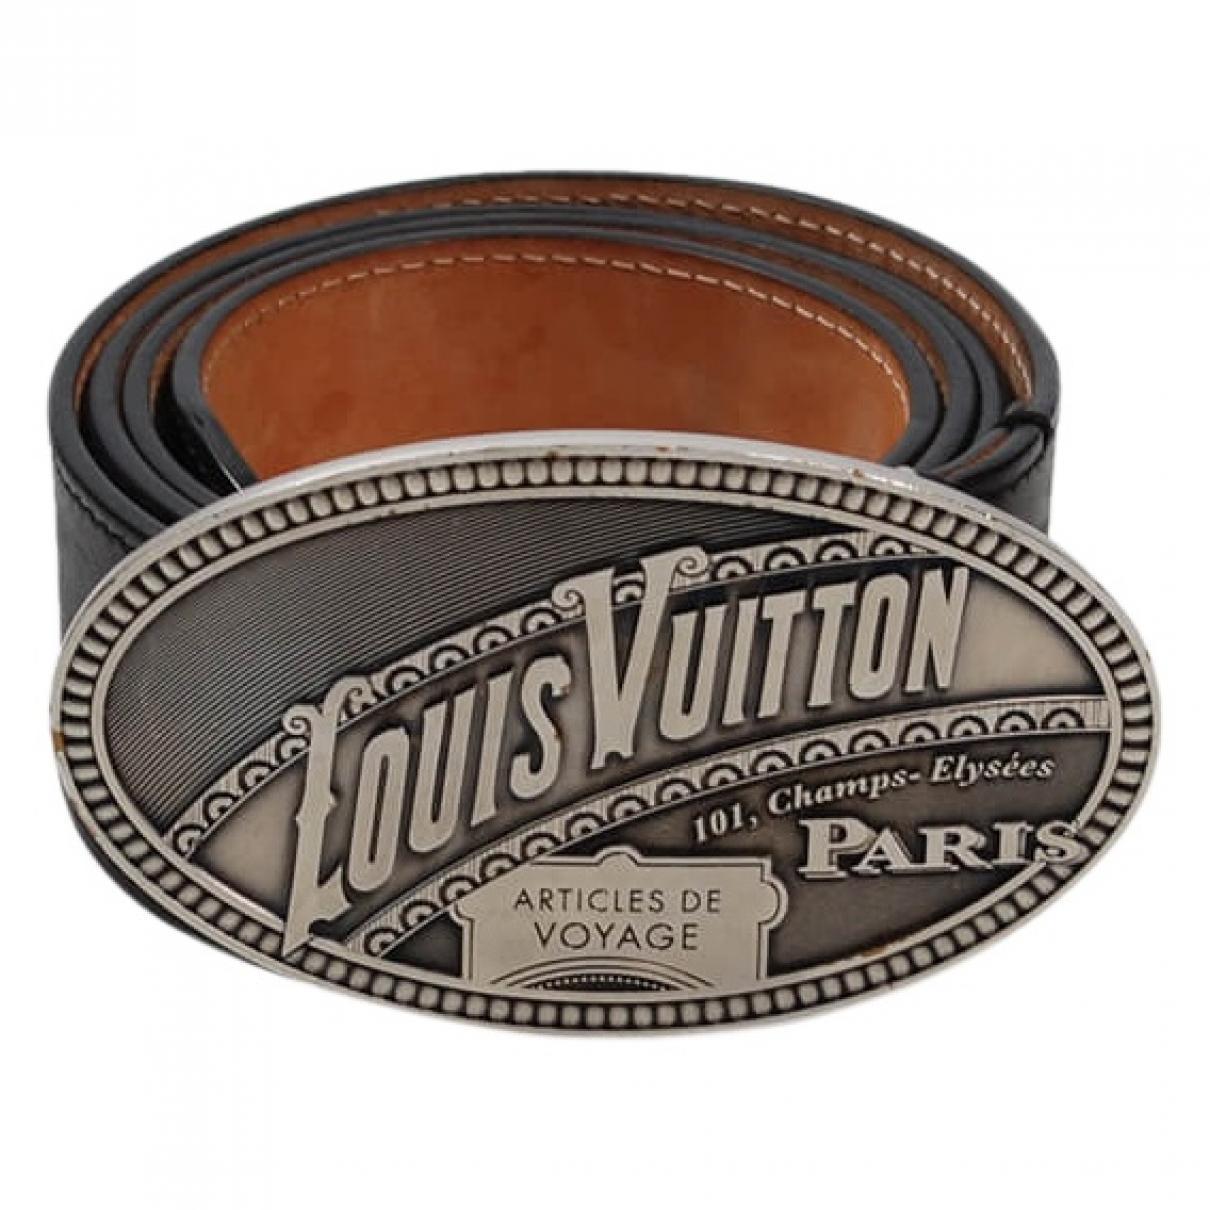 7c0b37416db9 Louis Vuitton Black Leather Belts in Black for Men - Lyst